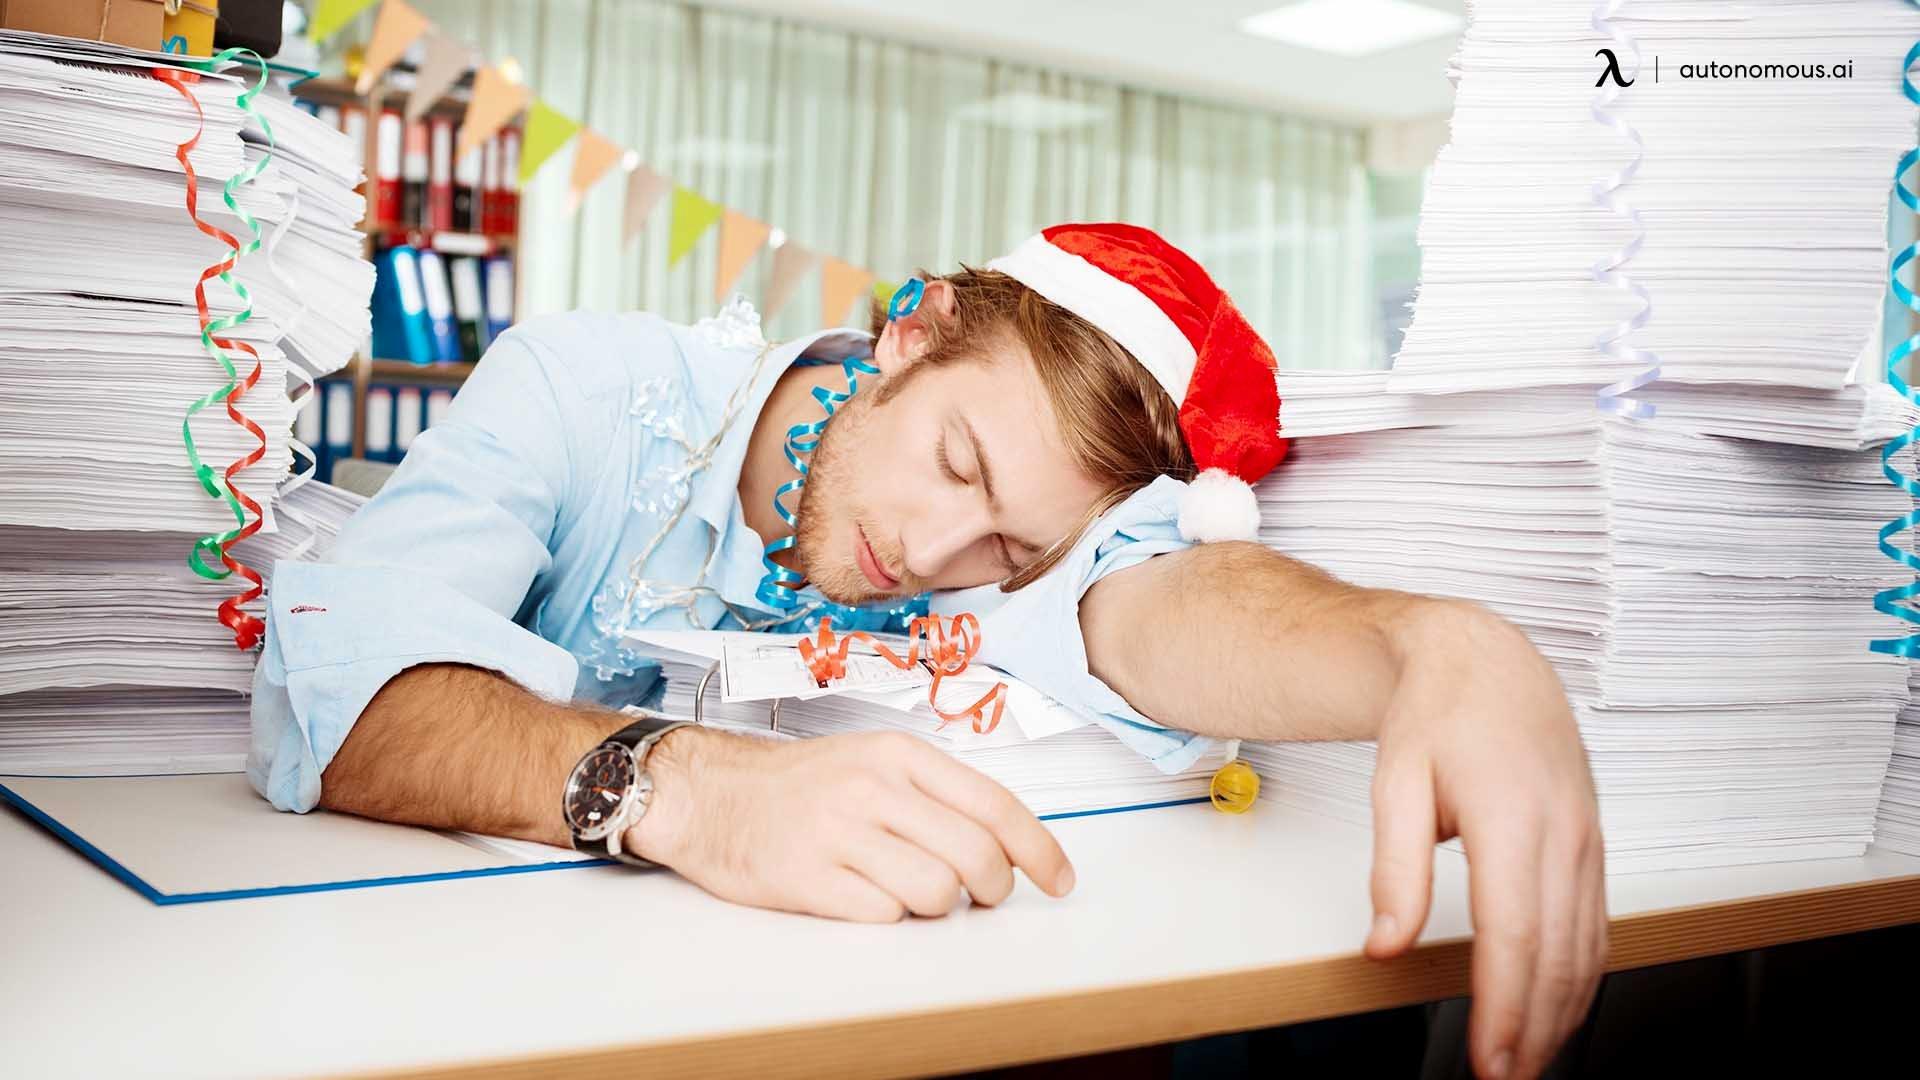 Year-end fatigue